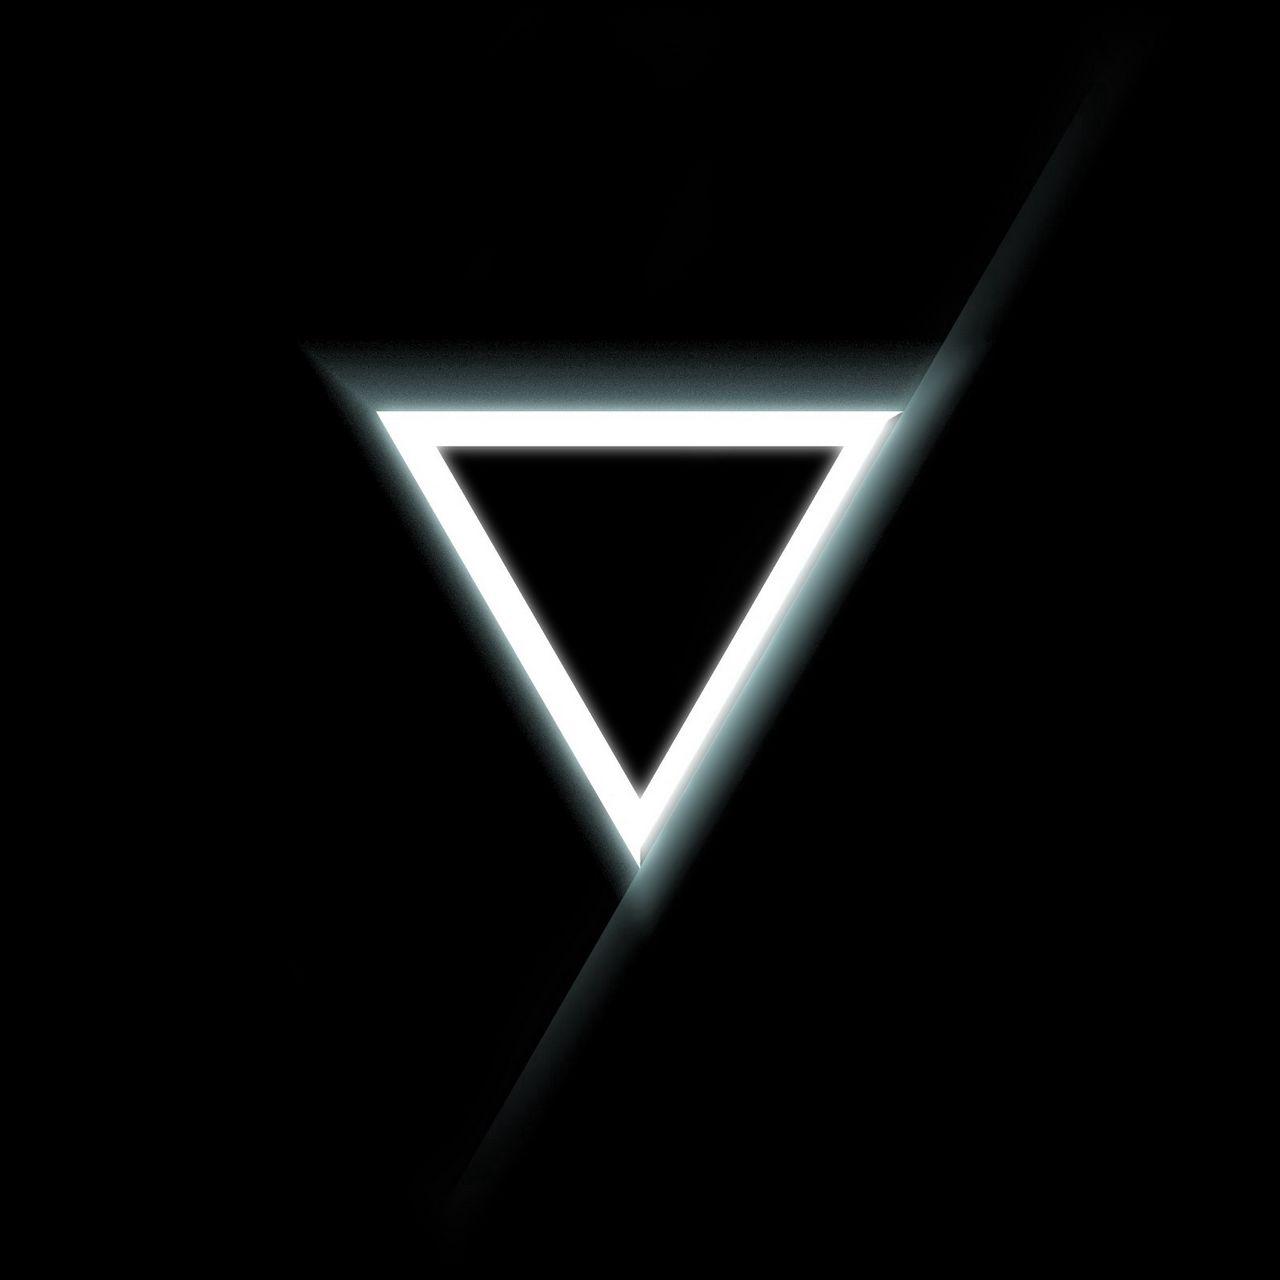 1280x1280 Wallpaper triangle, inverted, black, white